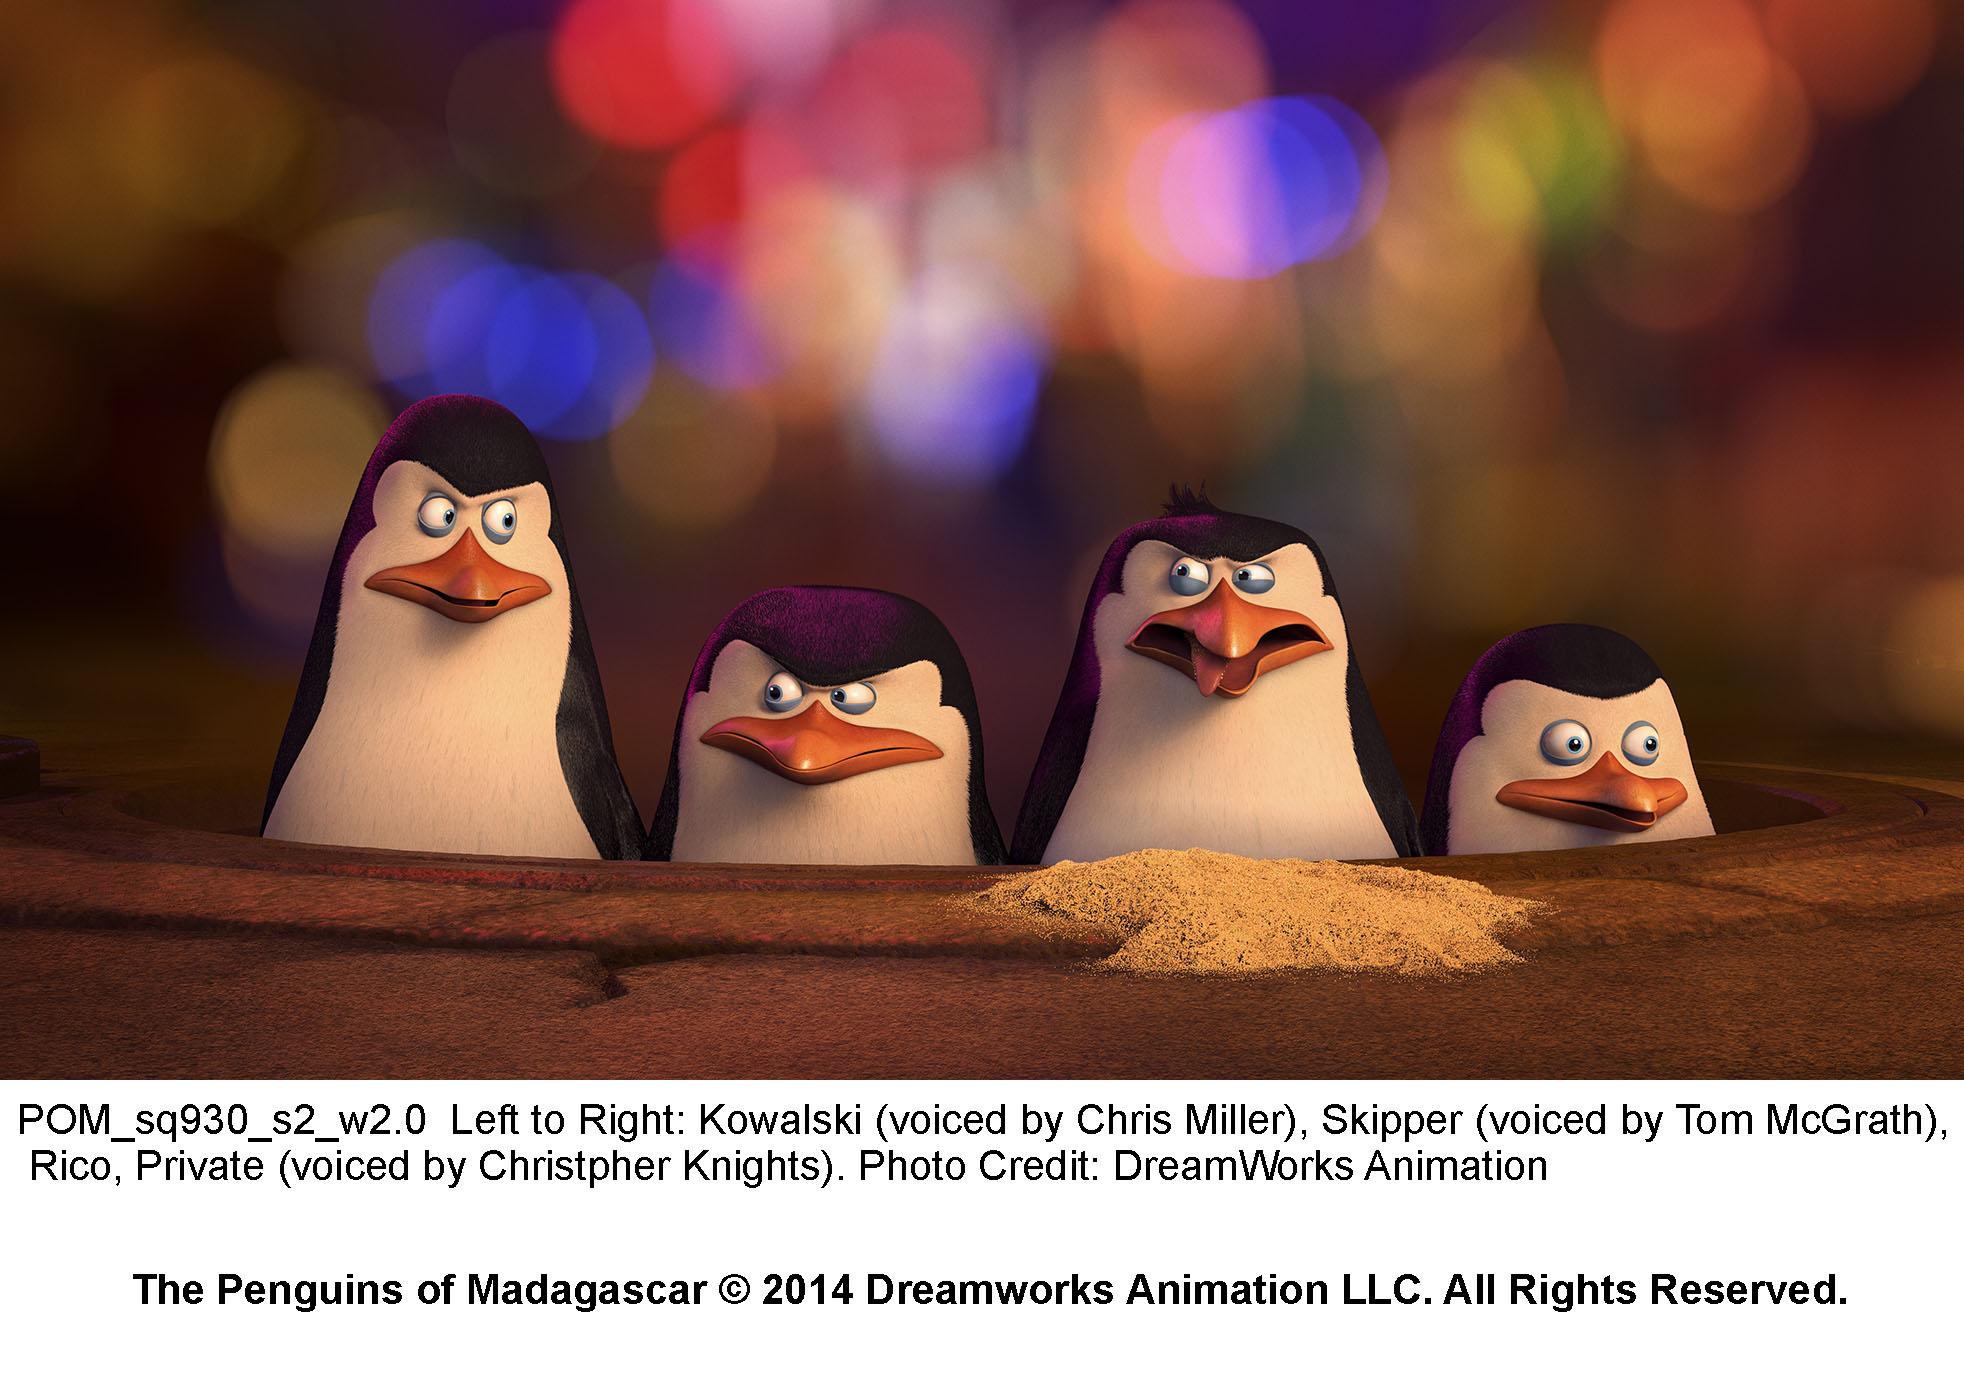 кадры из фильма Пингвины Мадагаскара